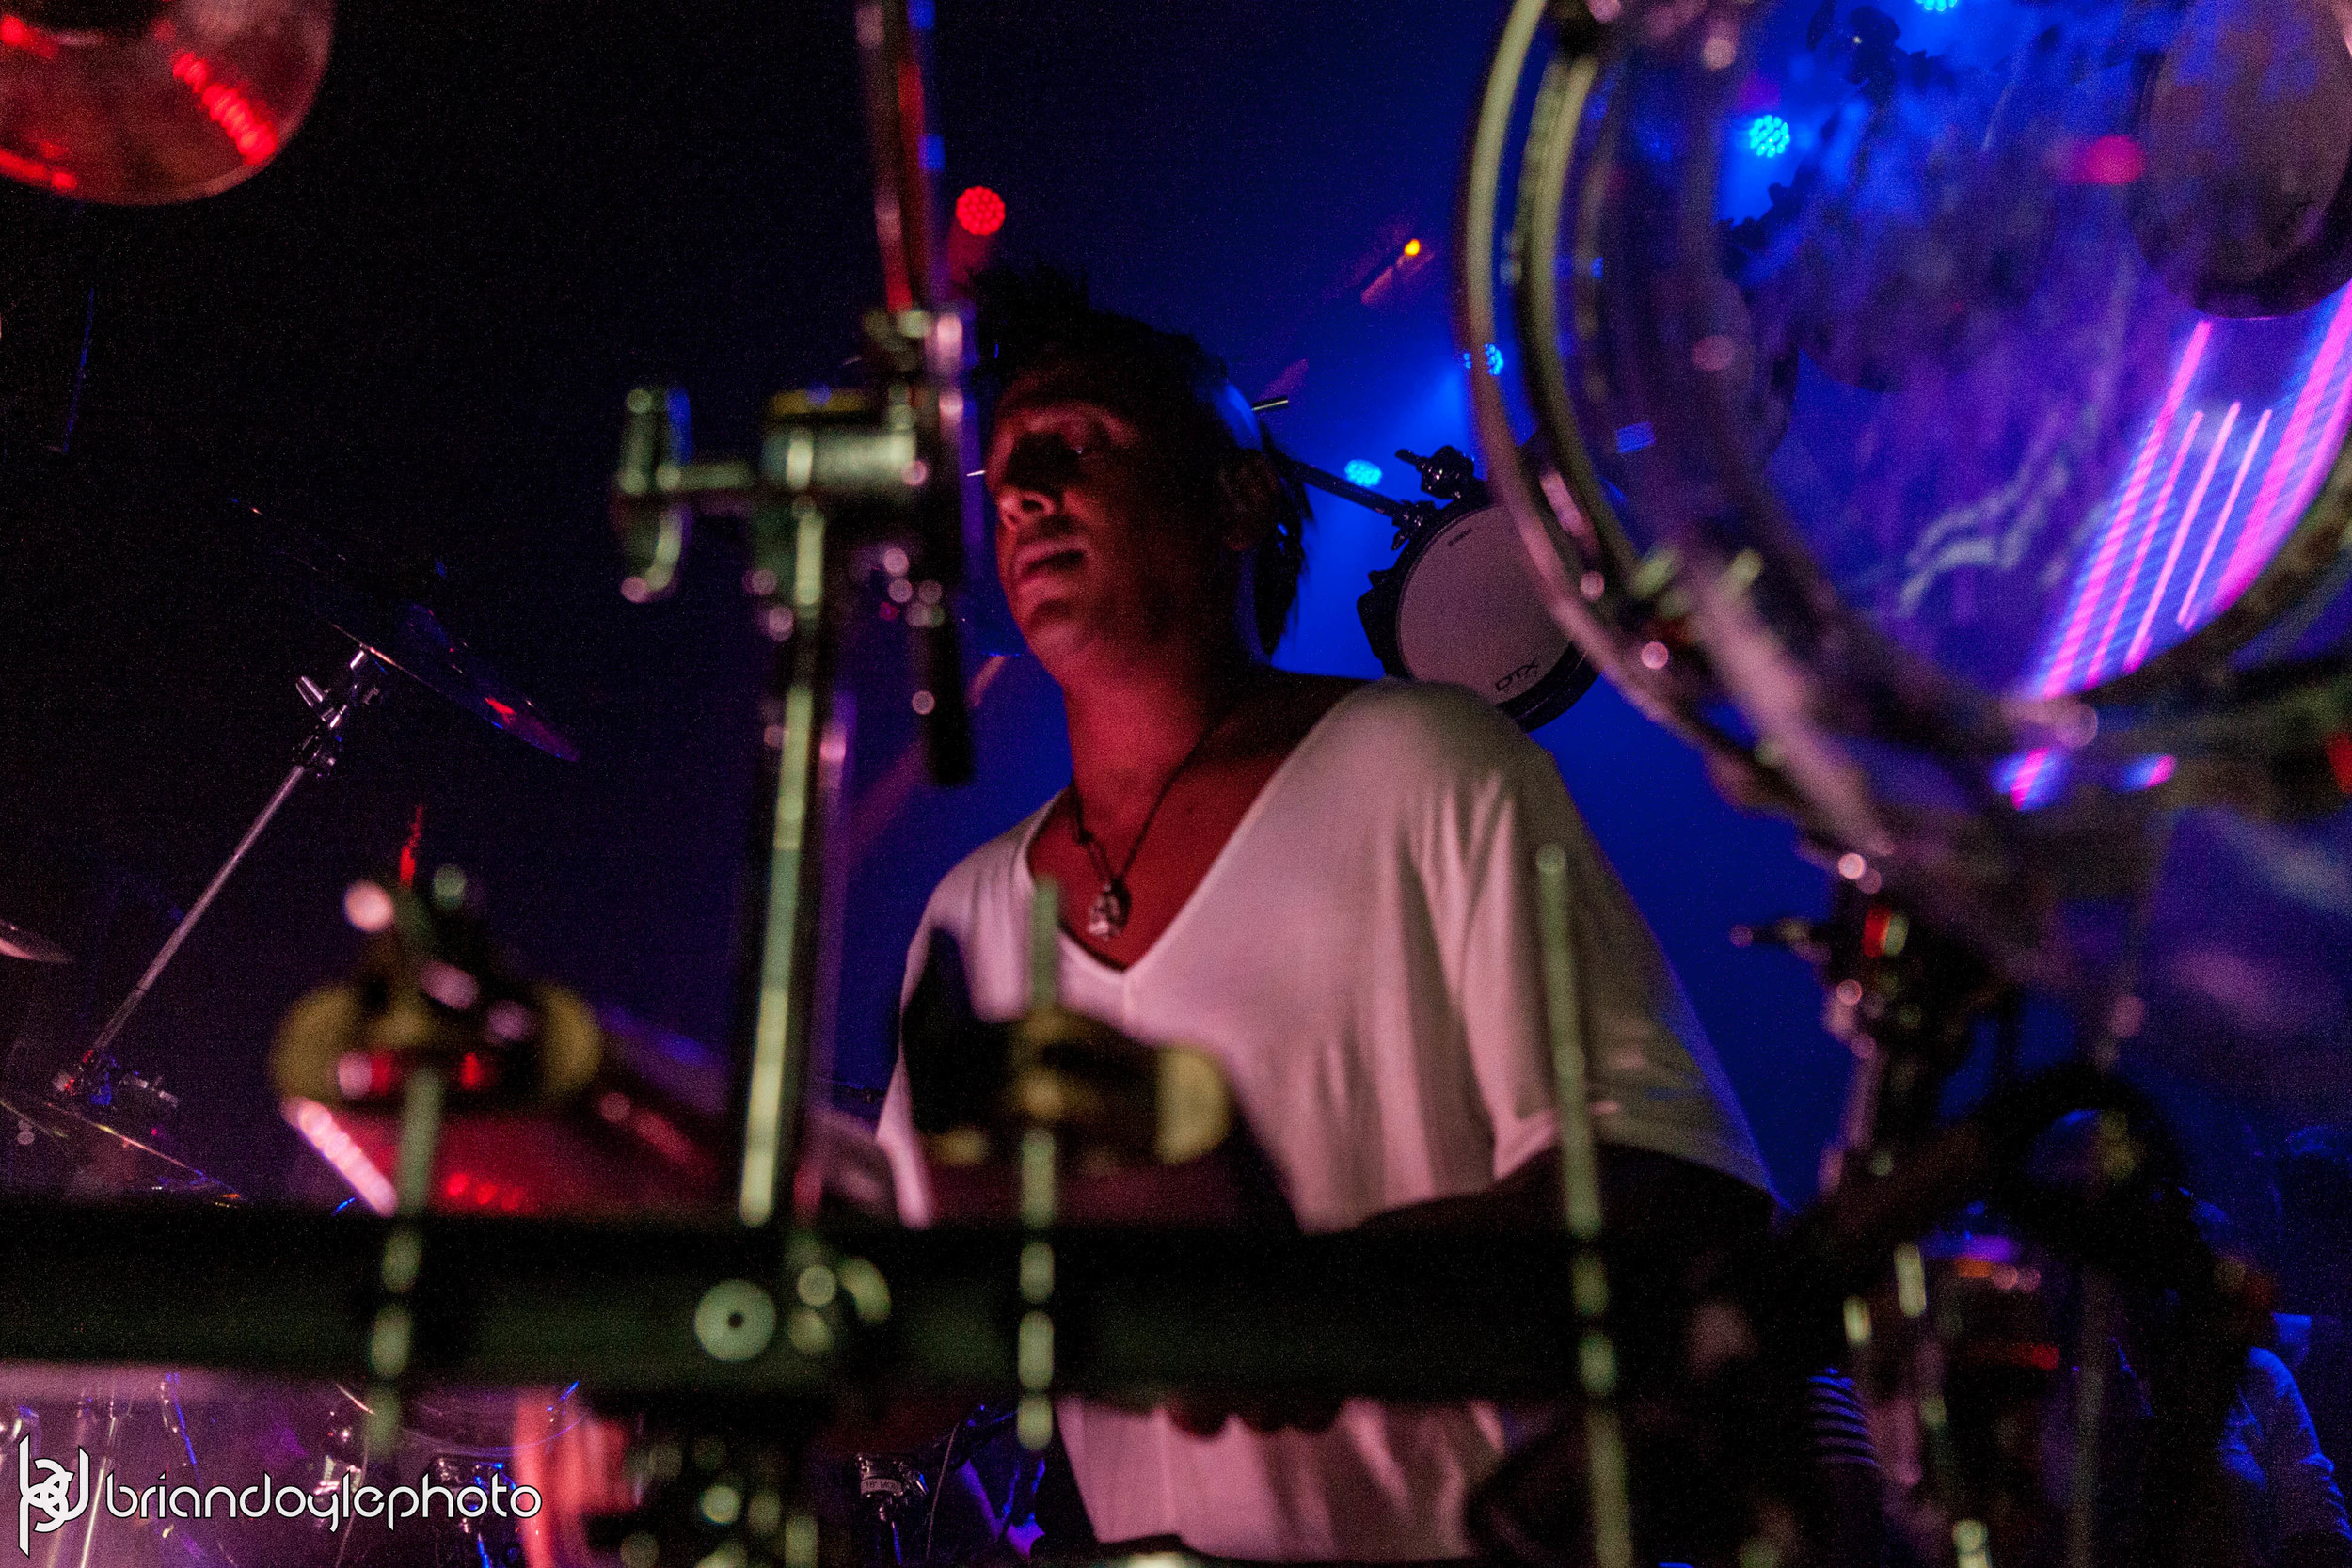 Jagermeister Presents - Paul Oakenfold @ Avalon bdp 27.09.14-45.jpg